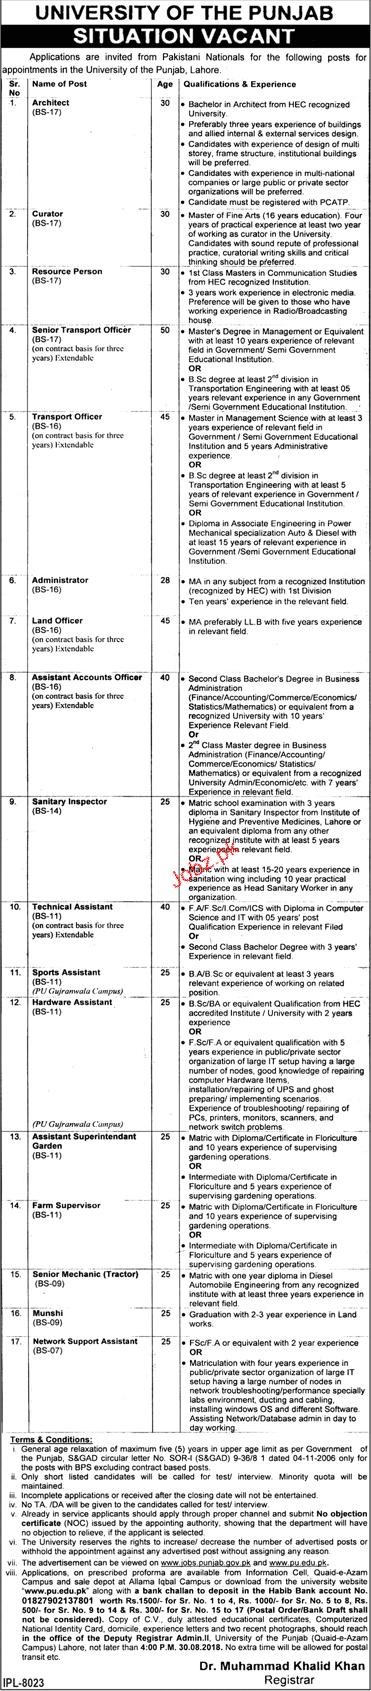 University of the Punjab Architects, Curator Jobs